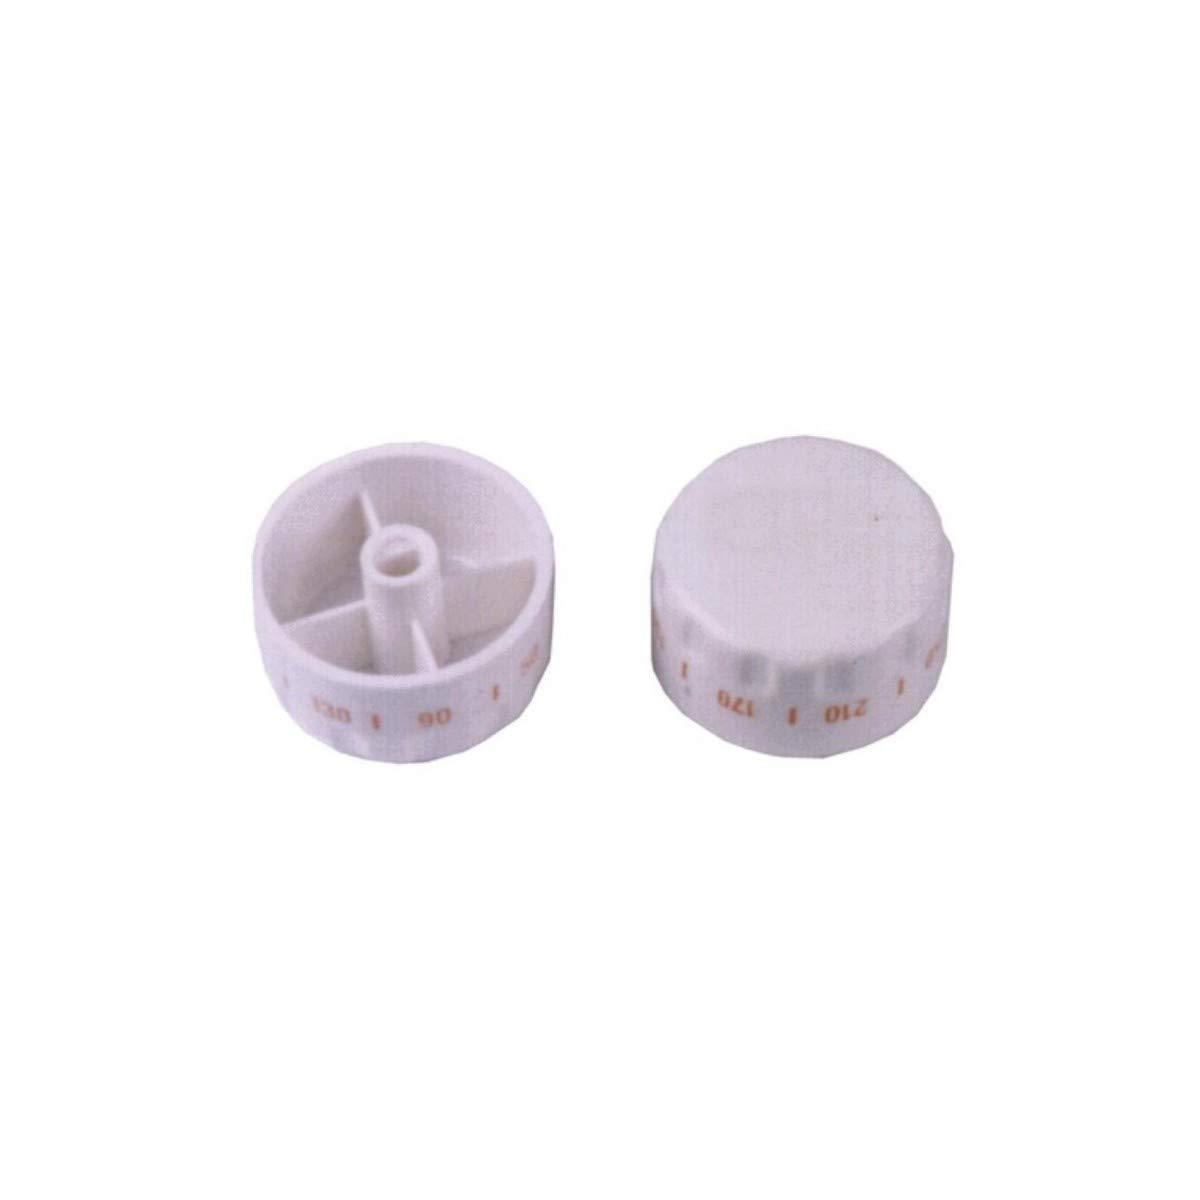 Mando termostato Horno Teka Blanco diametro Eje 6 mm HE490 ...